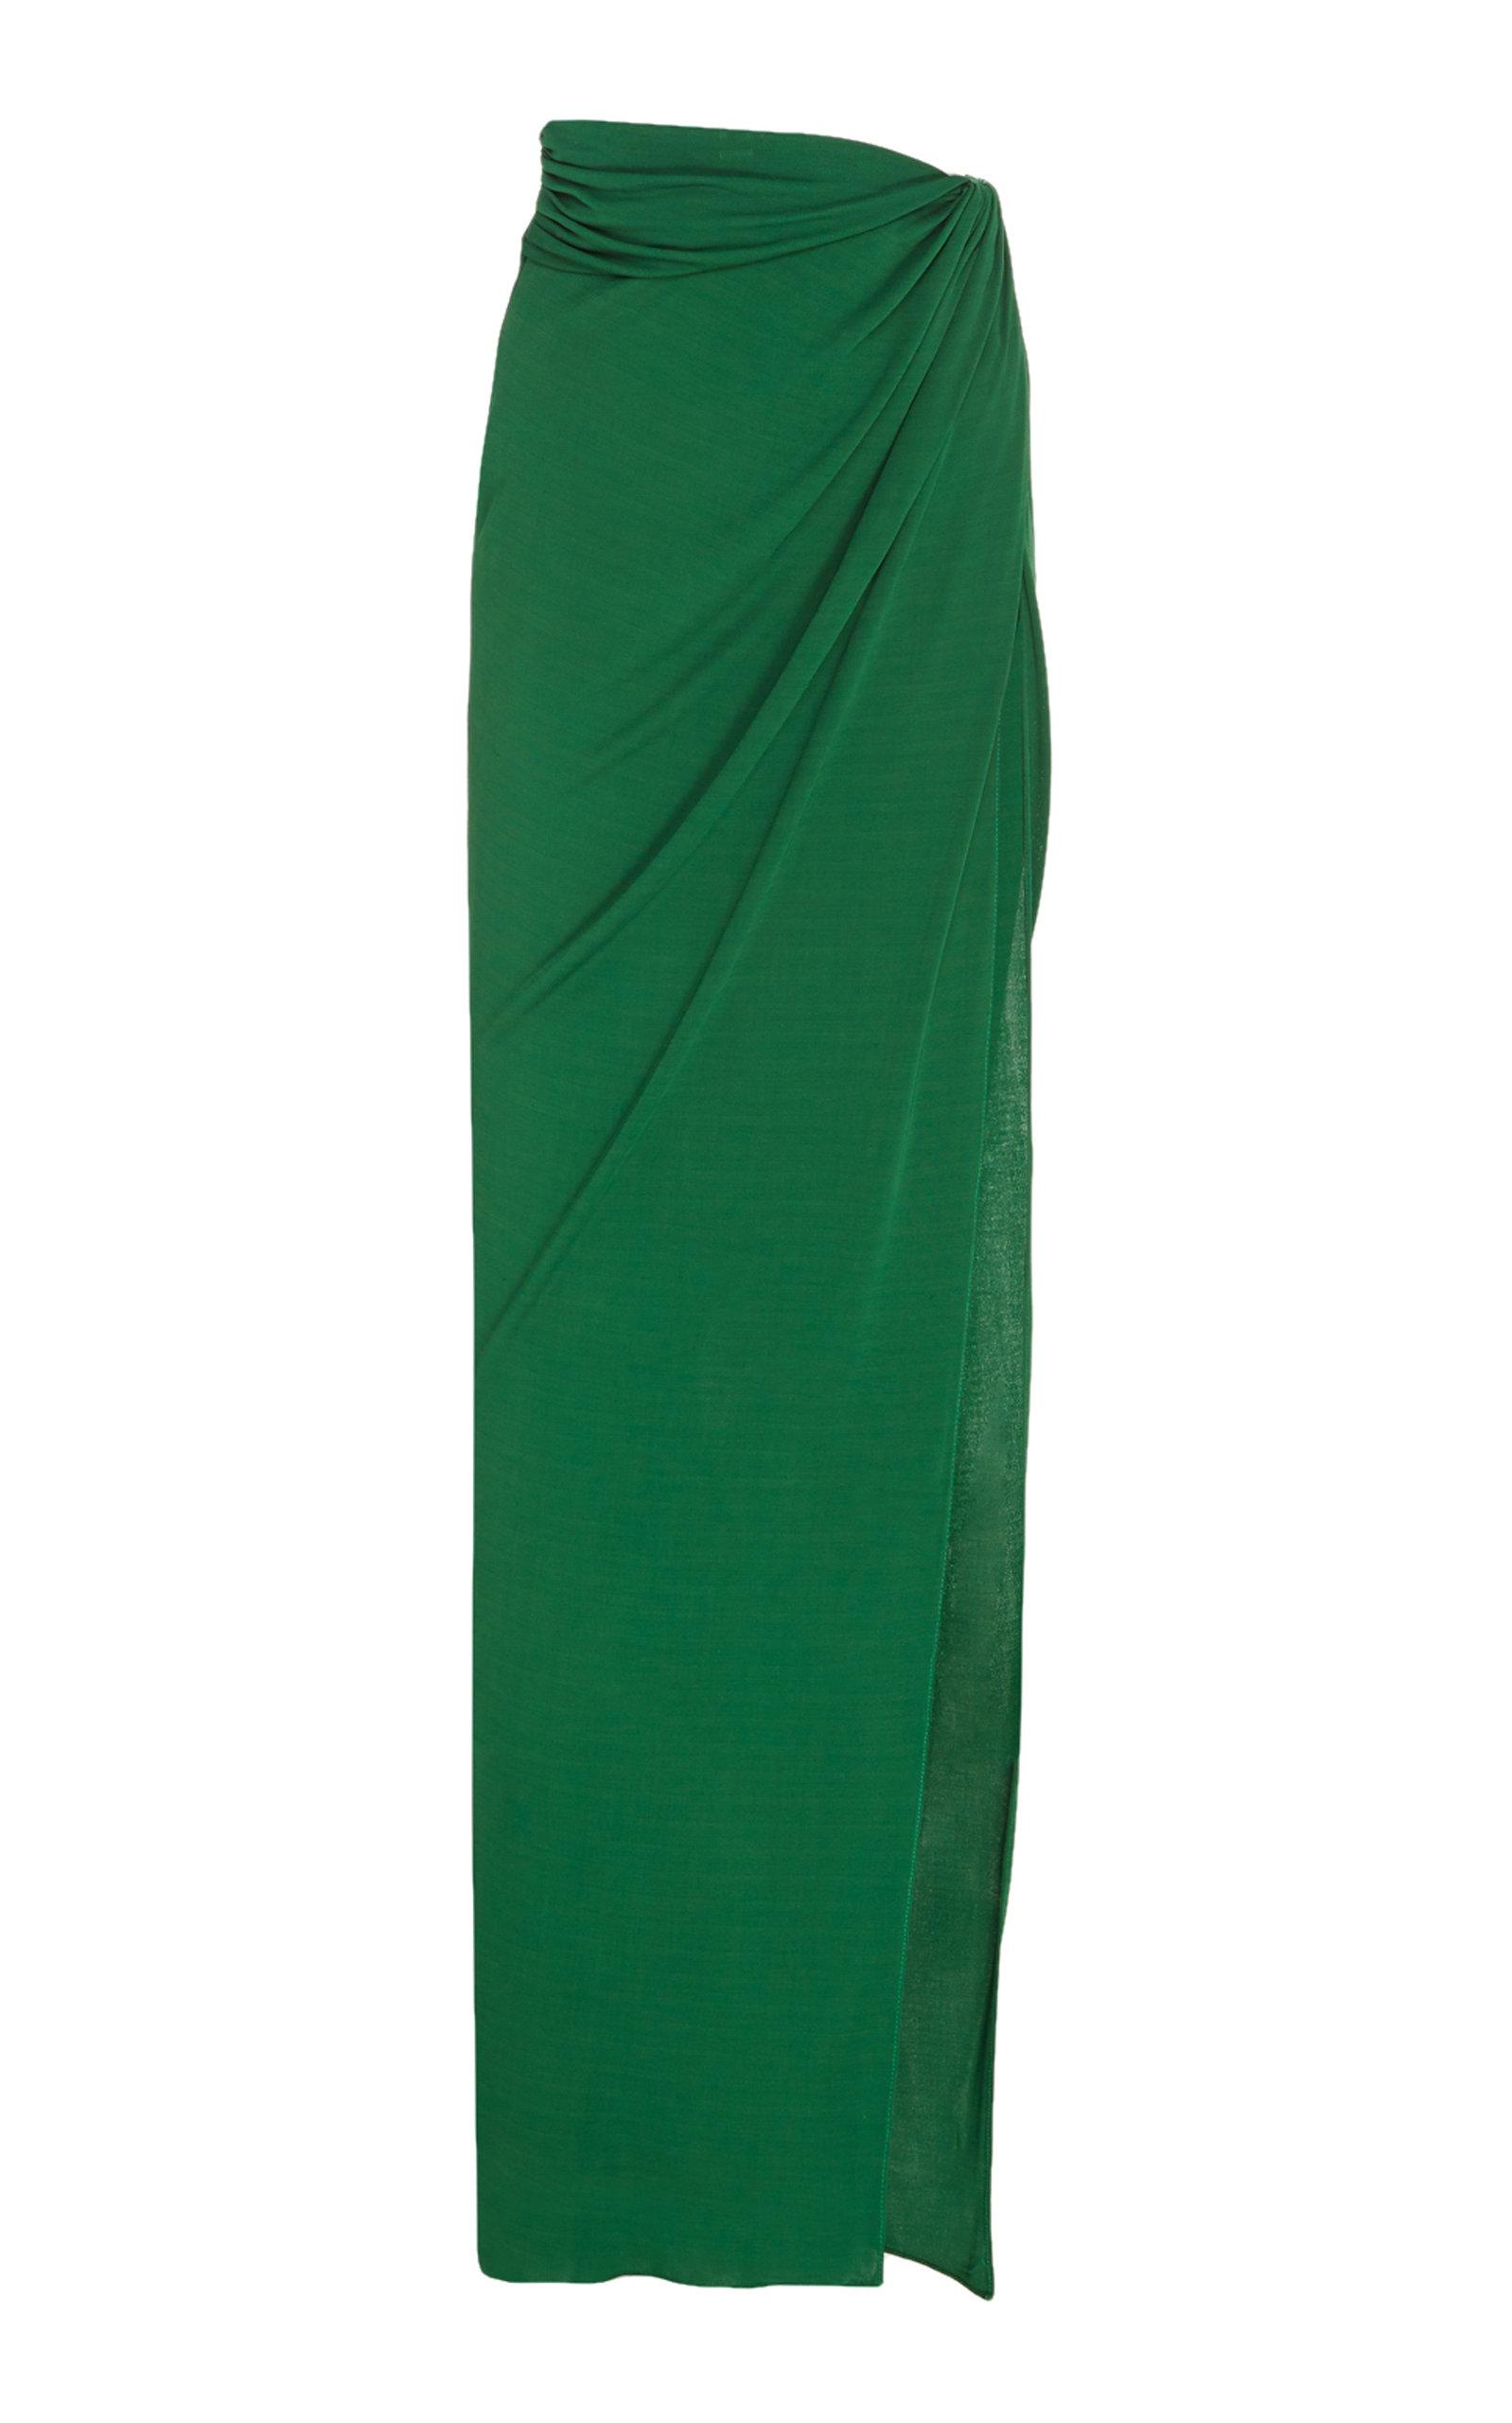 Voile D Ombrage 6 X 4 women's clothing | moda operandi | moda operandi